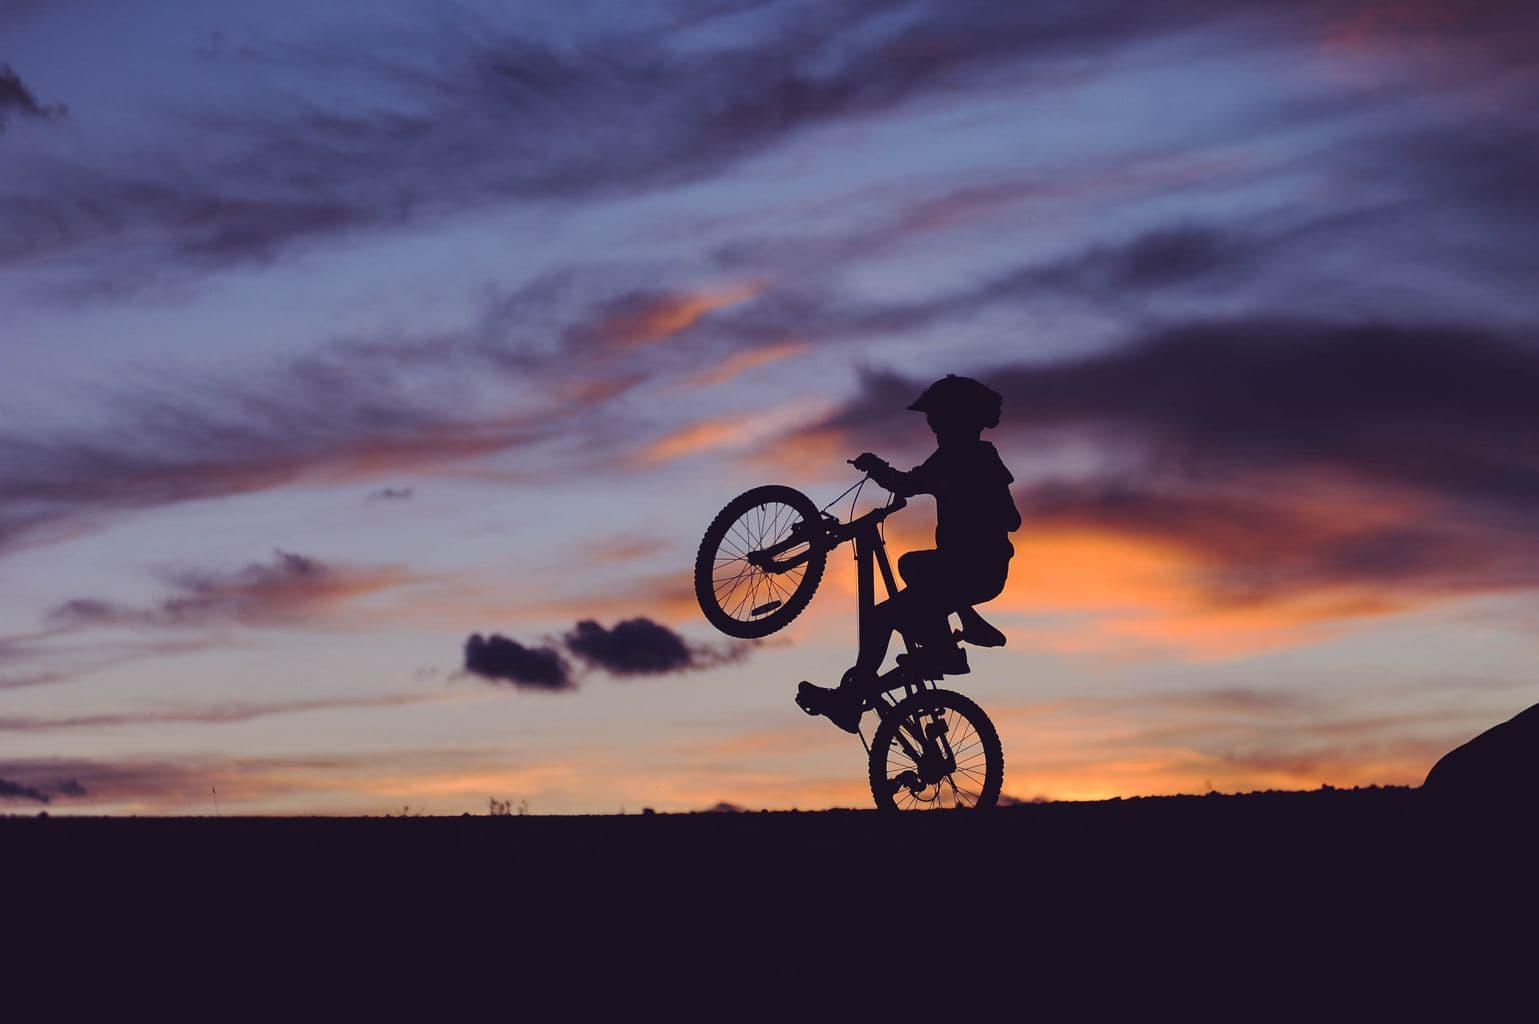 kid on bike with sunset